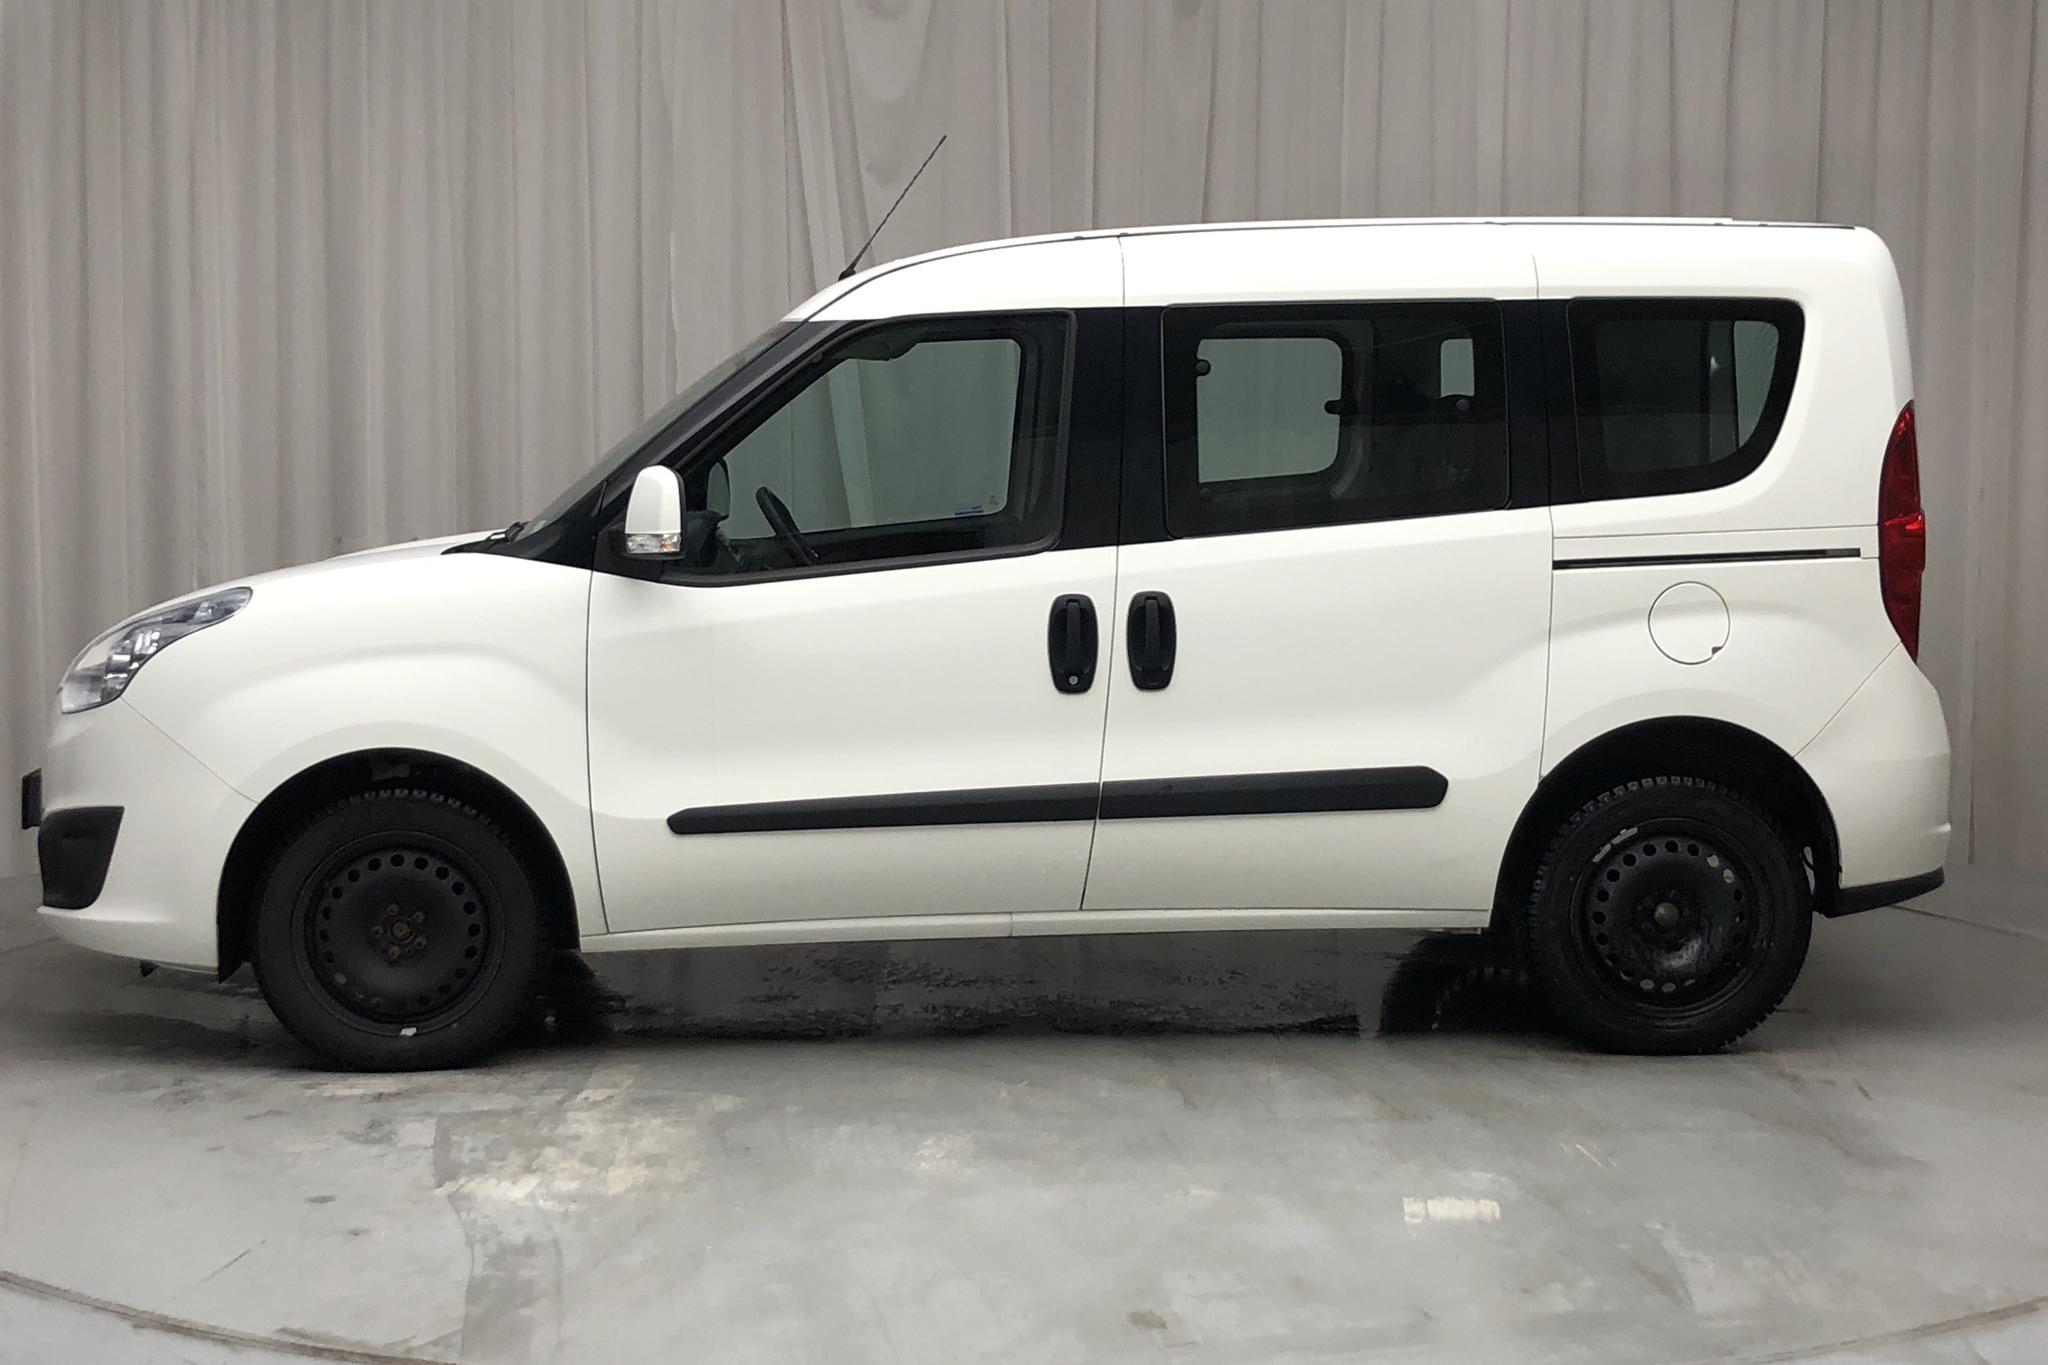 Opel Combo 1.3 CDTI Skåp (90hk) - 2 455 mil - Manuell - vit - 2016